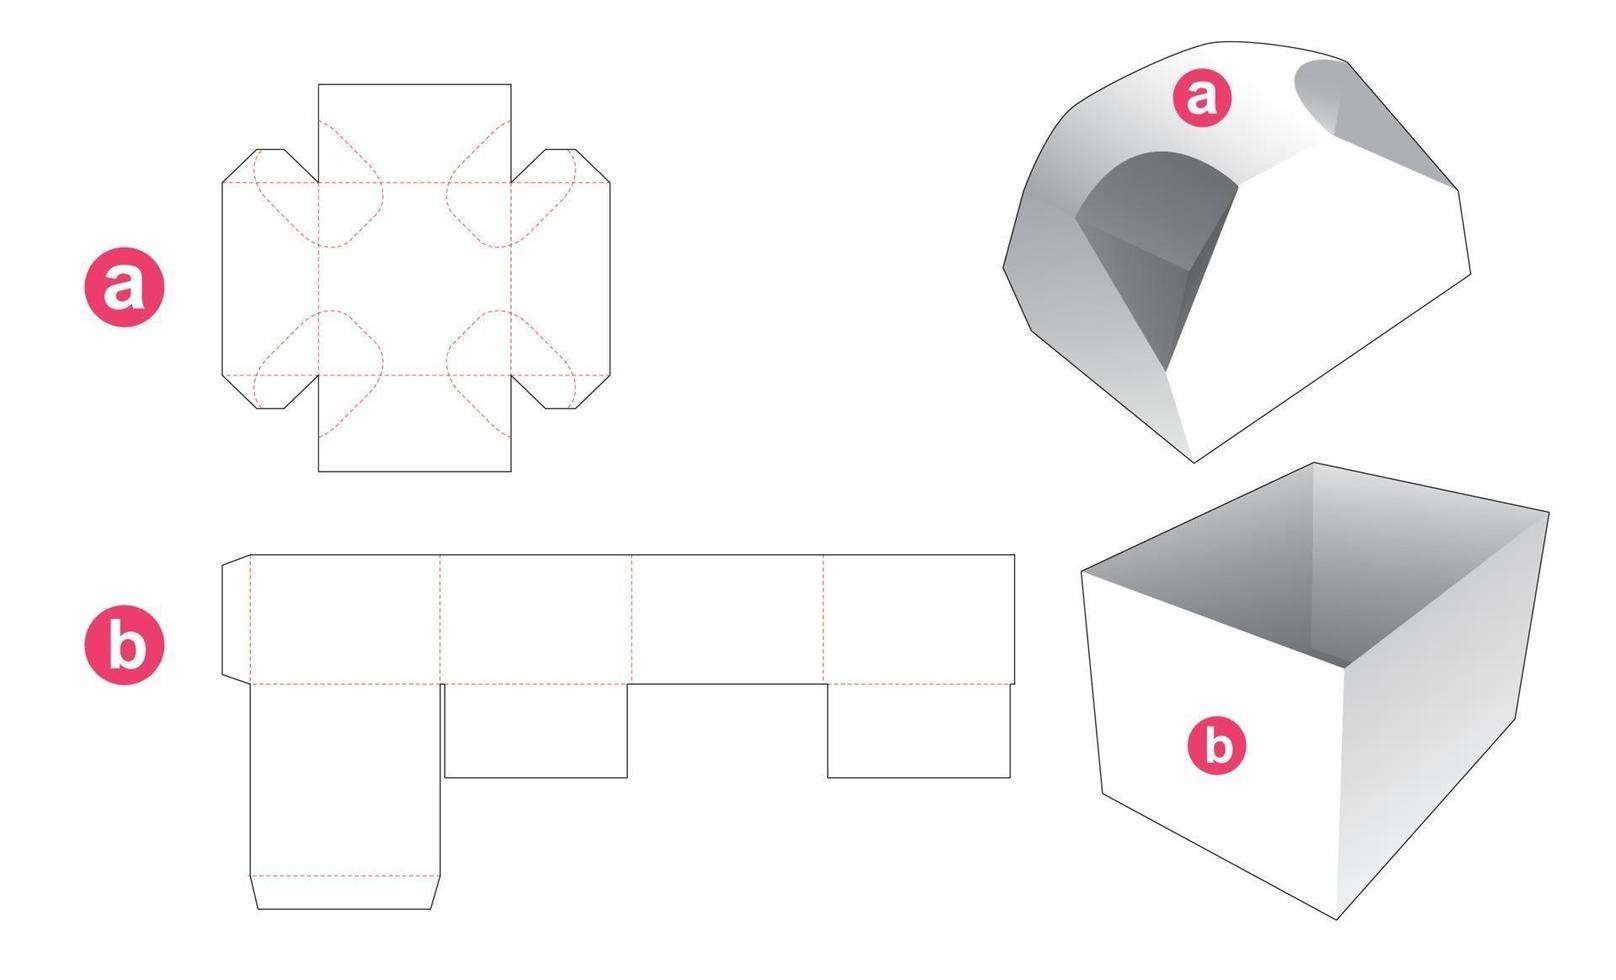 caixa de presente e molde recortado de tampa com 4 cantos chanfrados vetor